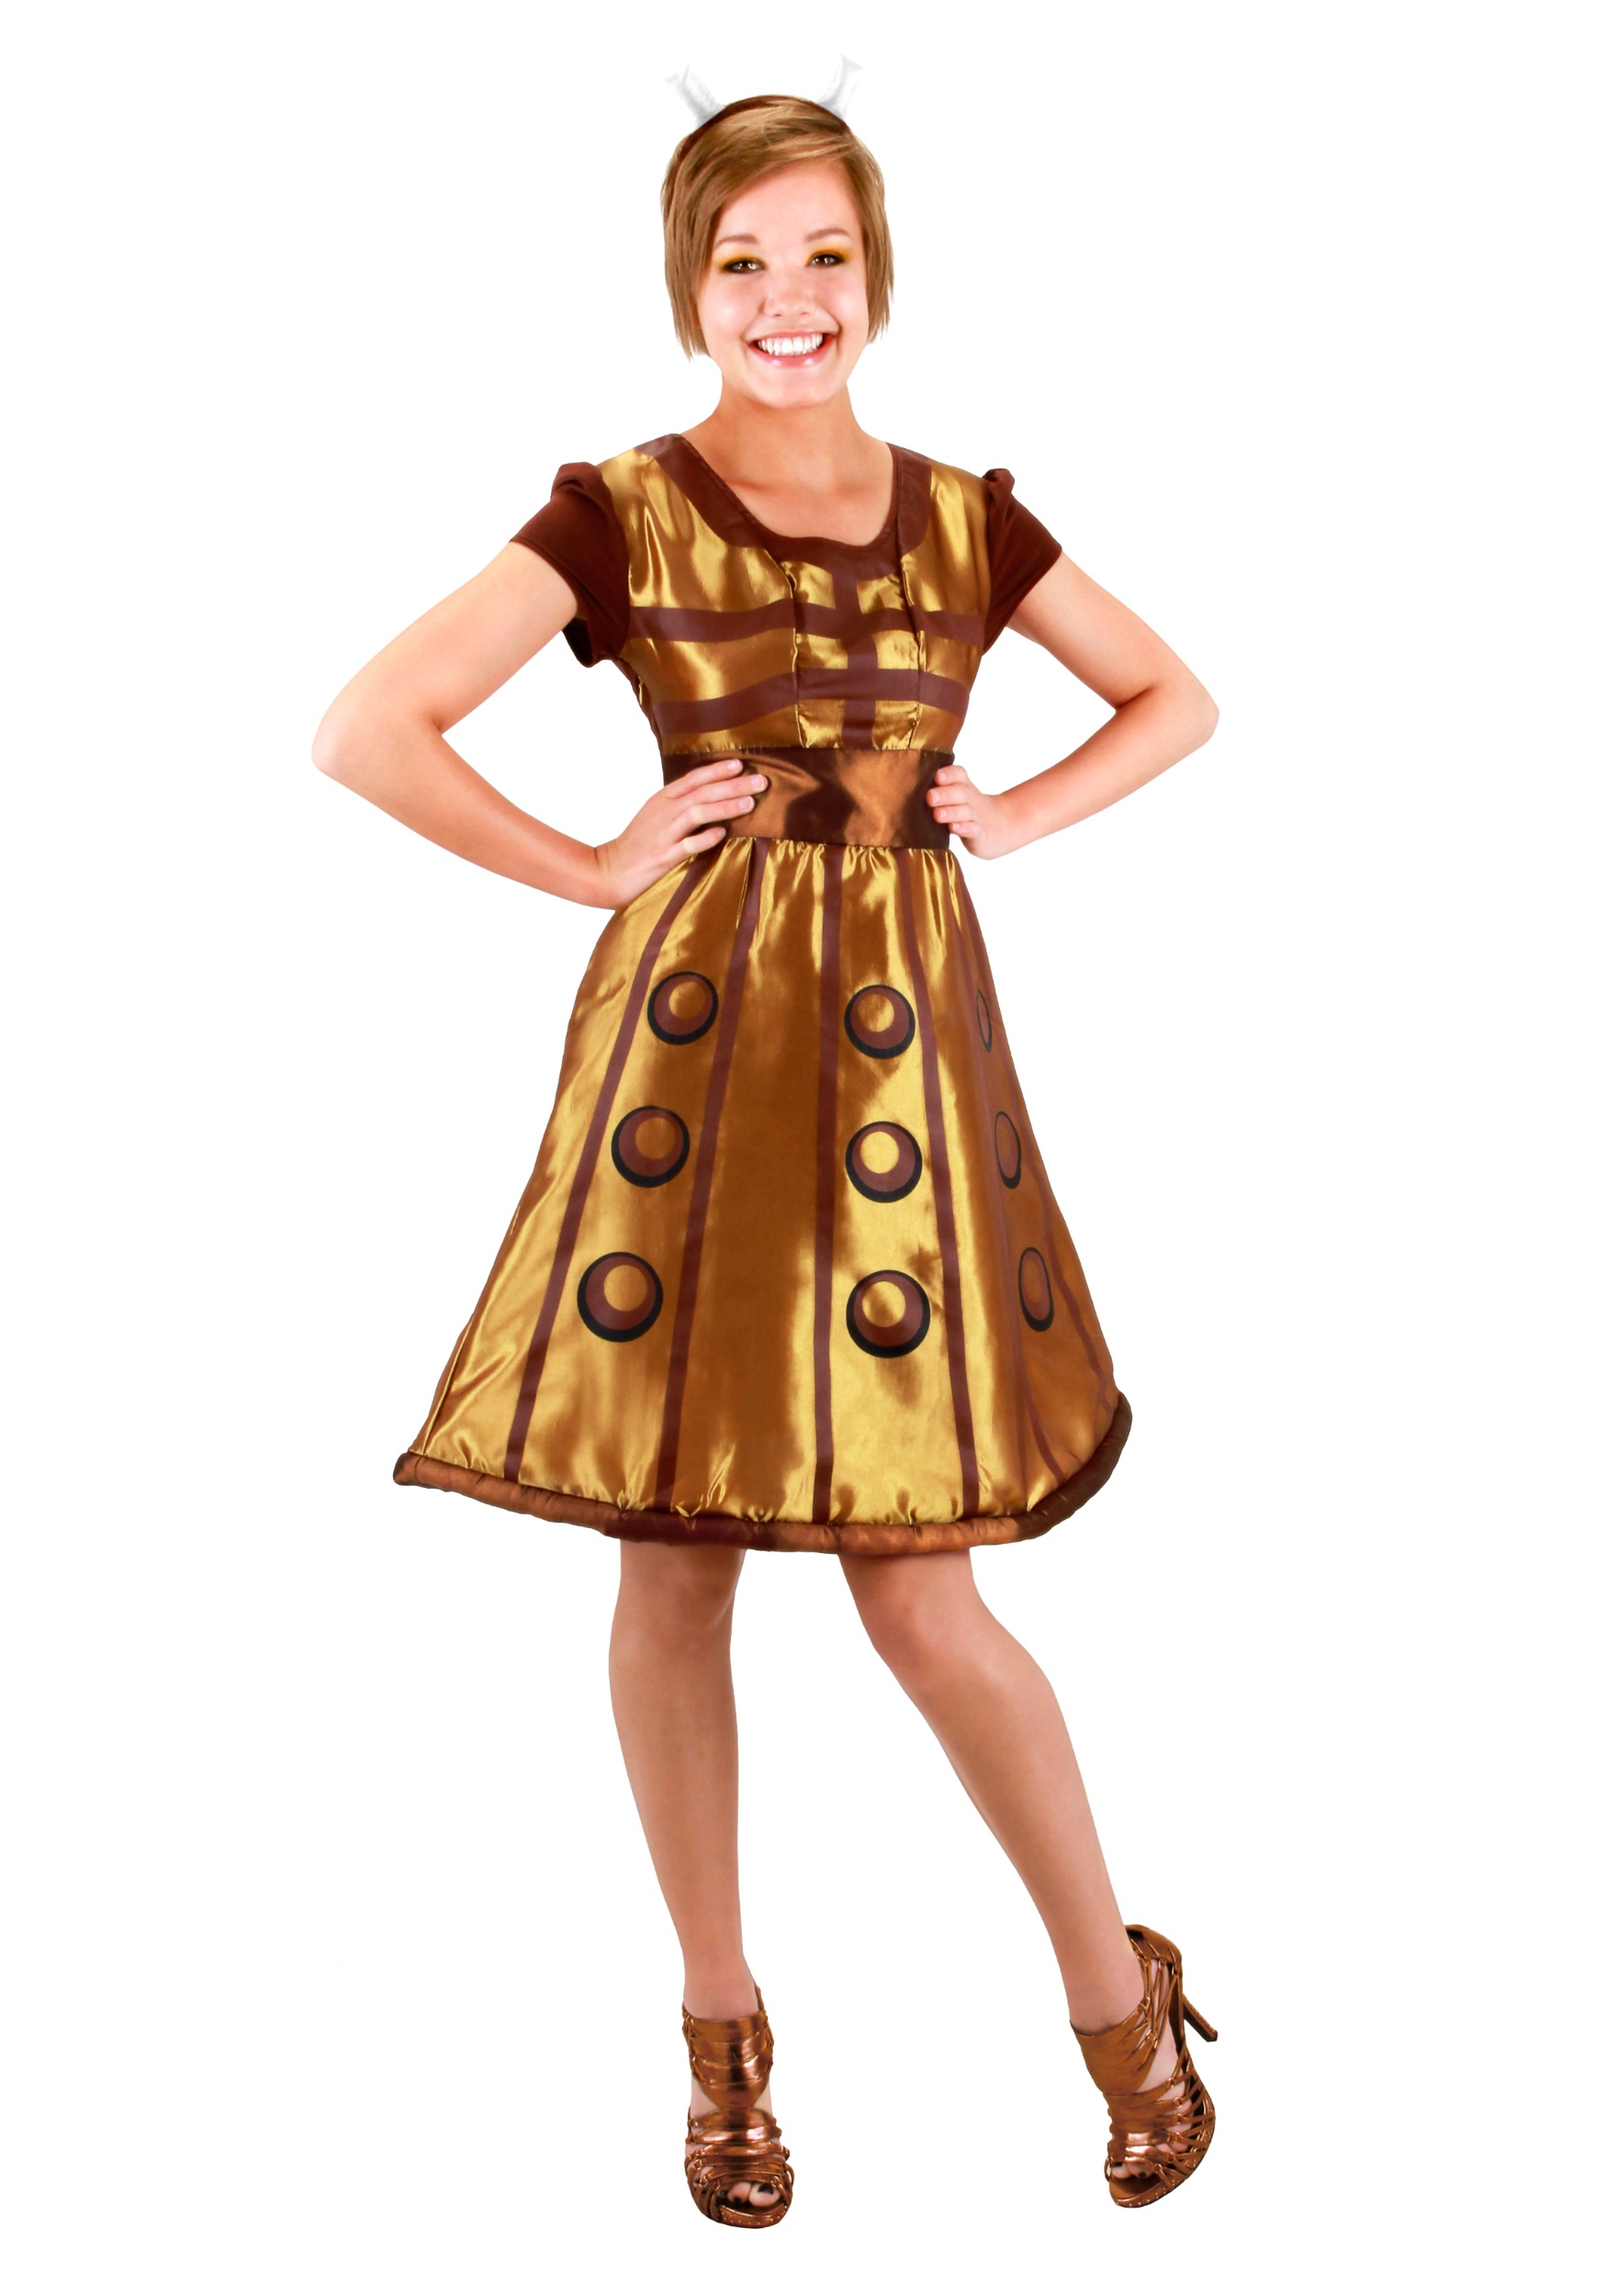 dr. who costume dalek dress